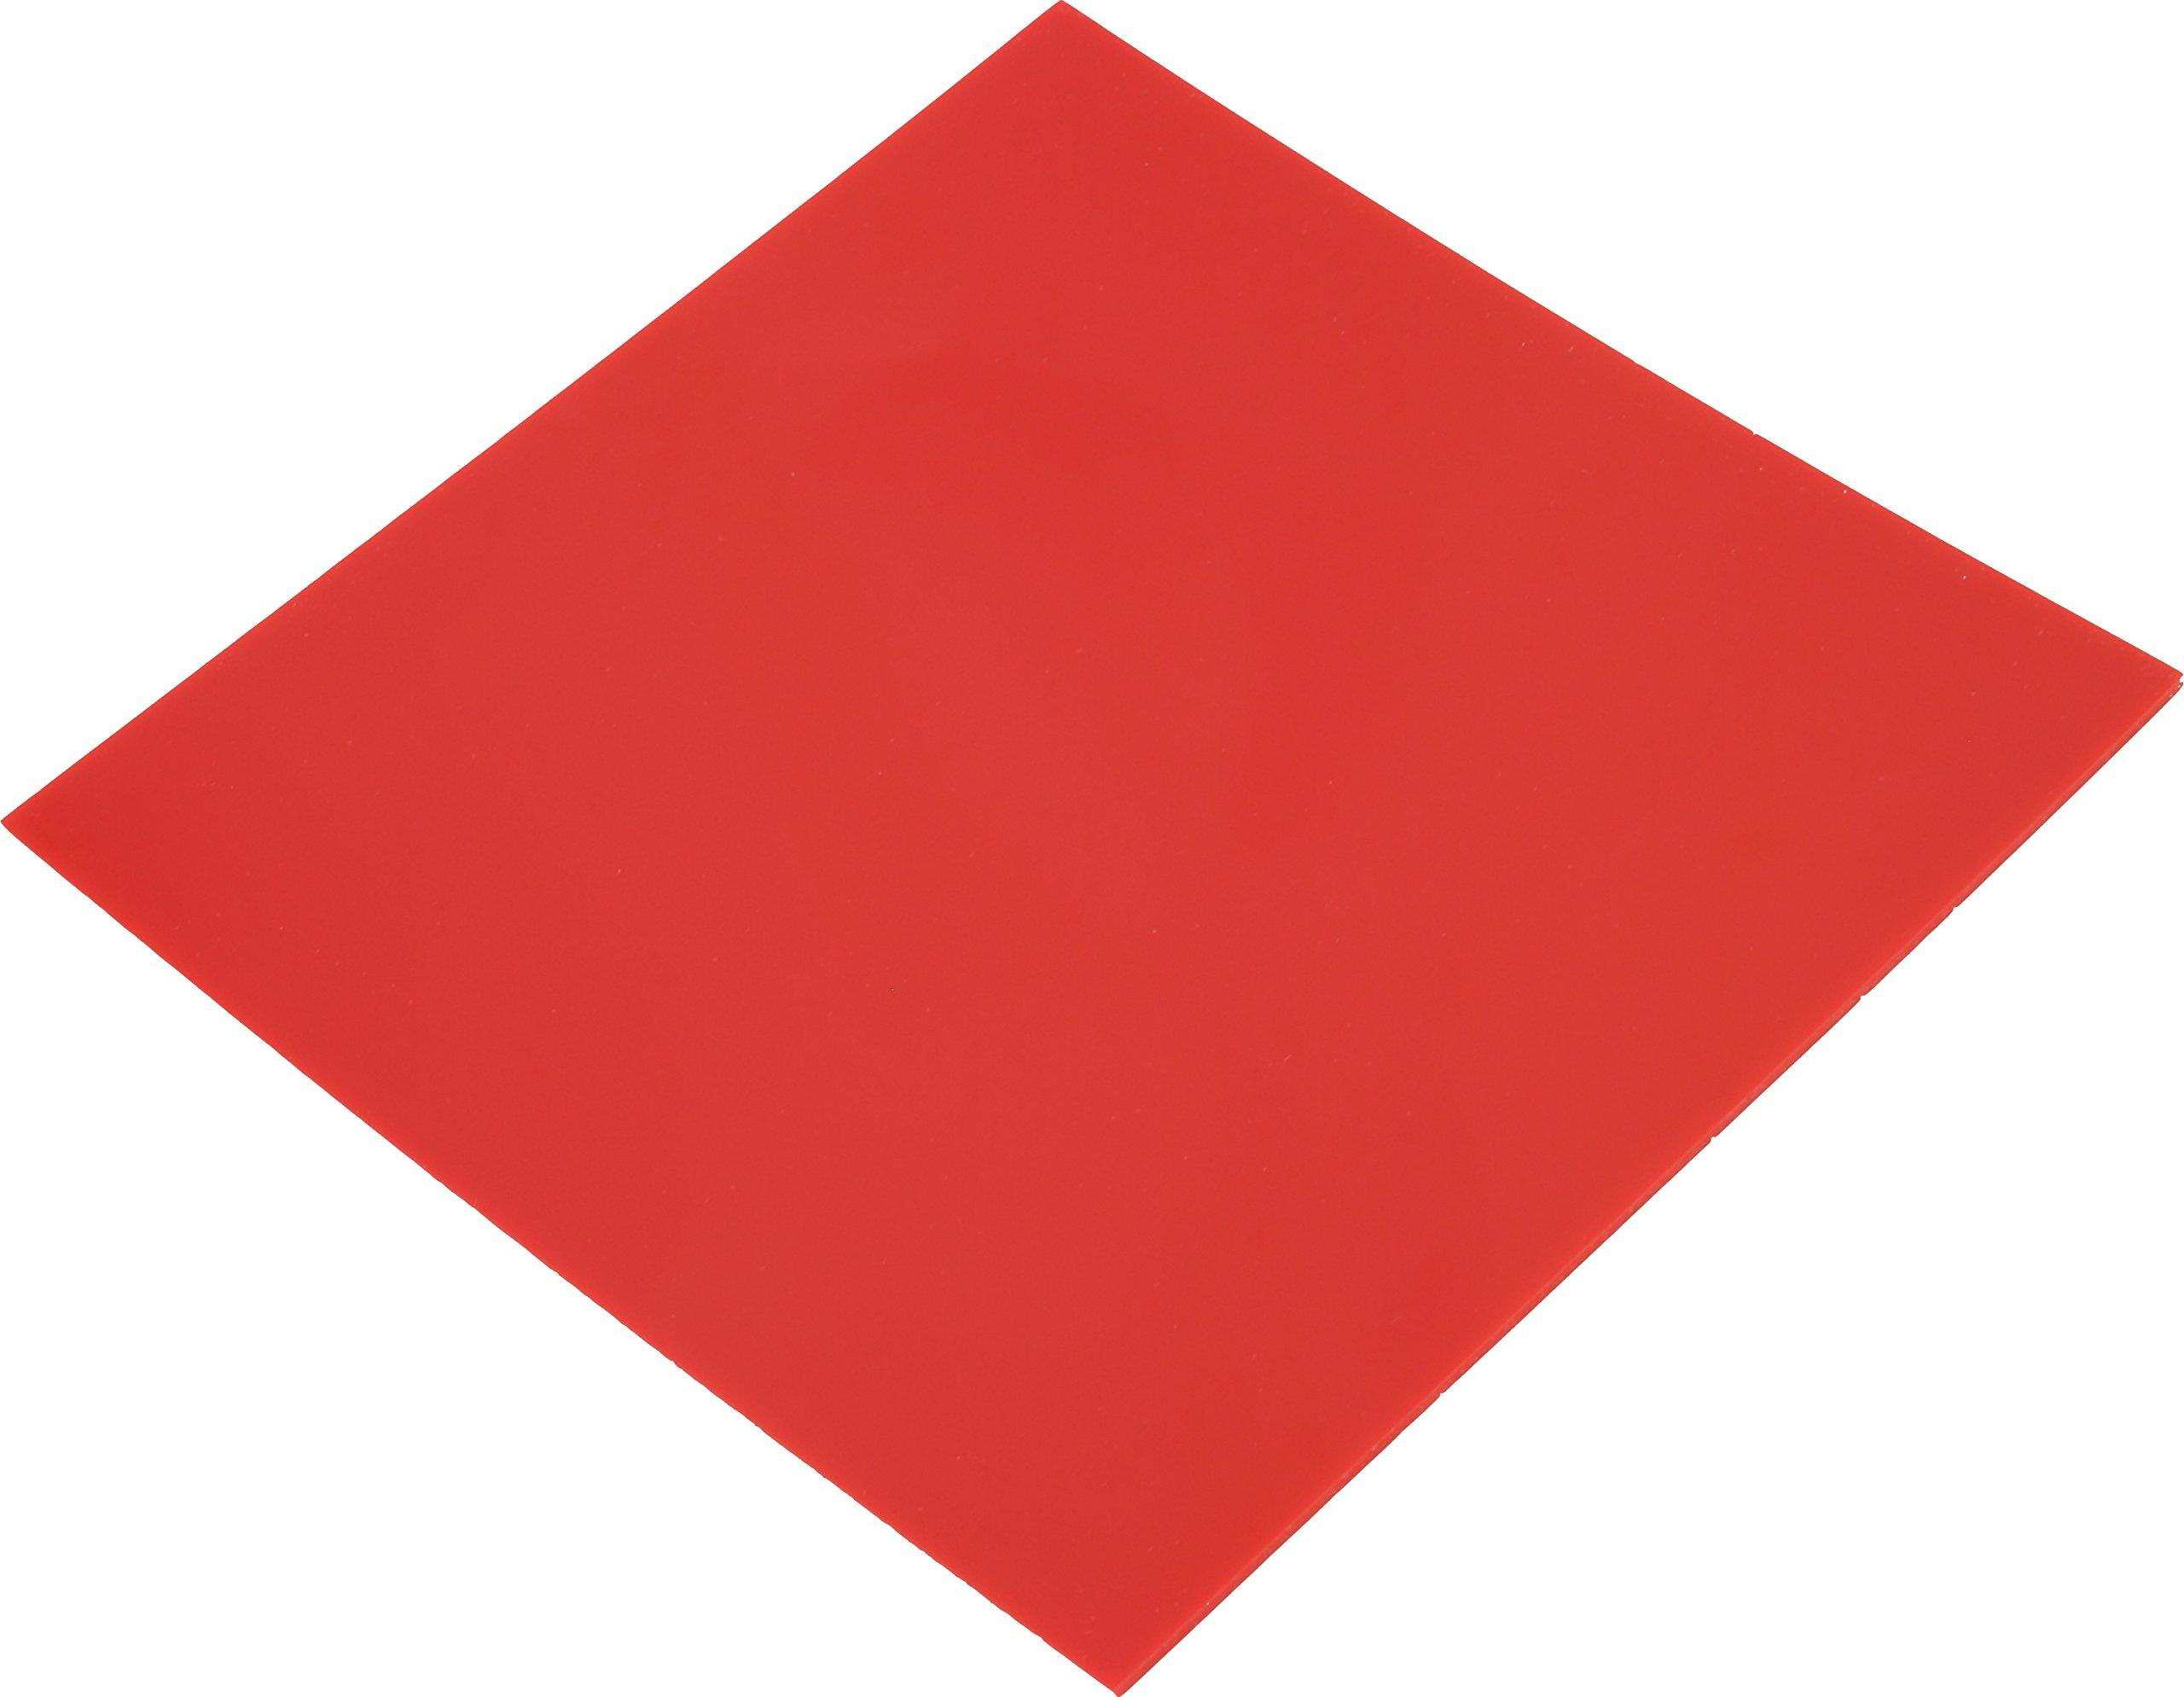 Pepetools 196.PU Durometer Urethane Pad, 6'' x 6'', 1/16'' Thick, 95 amp, Red